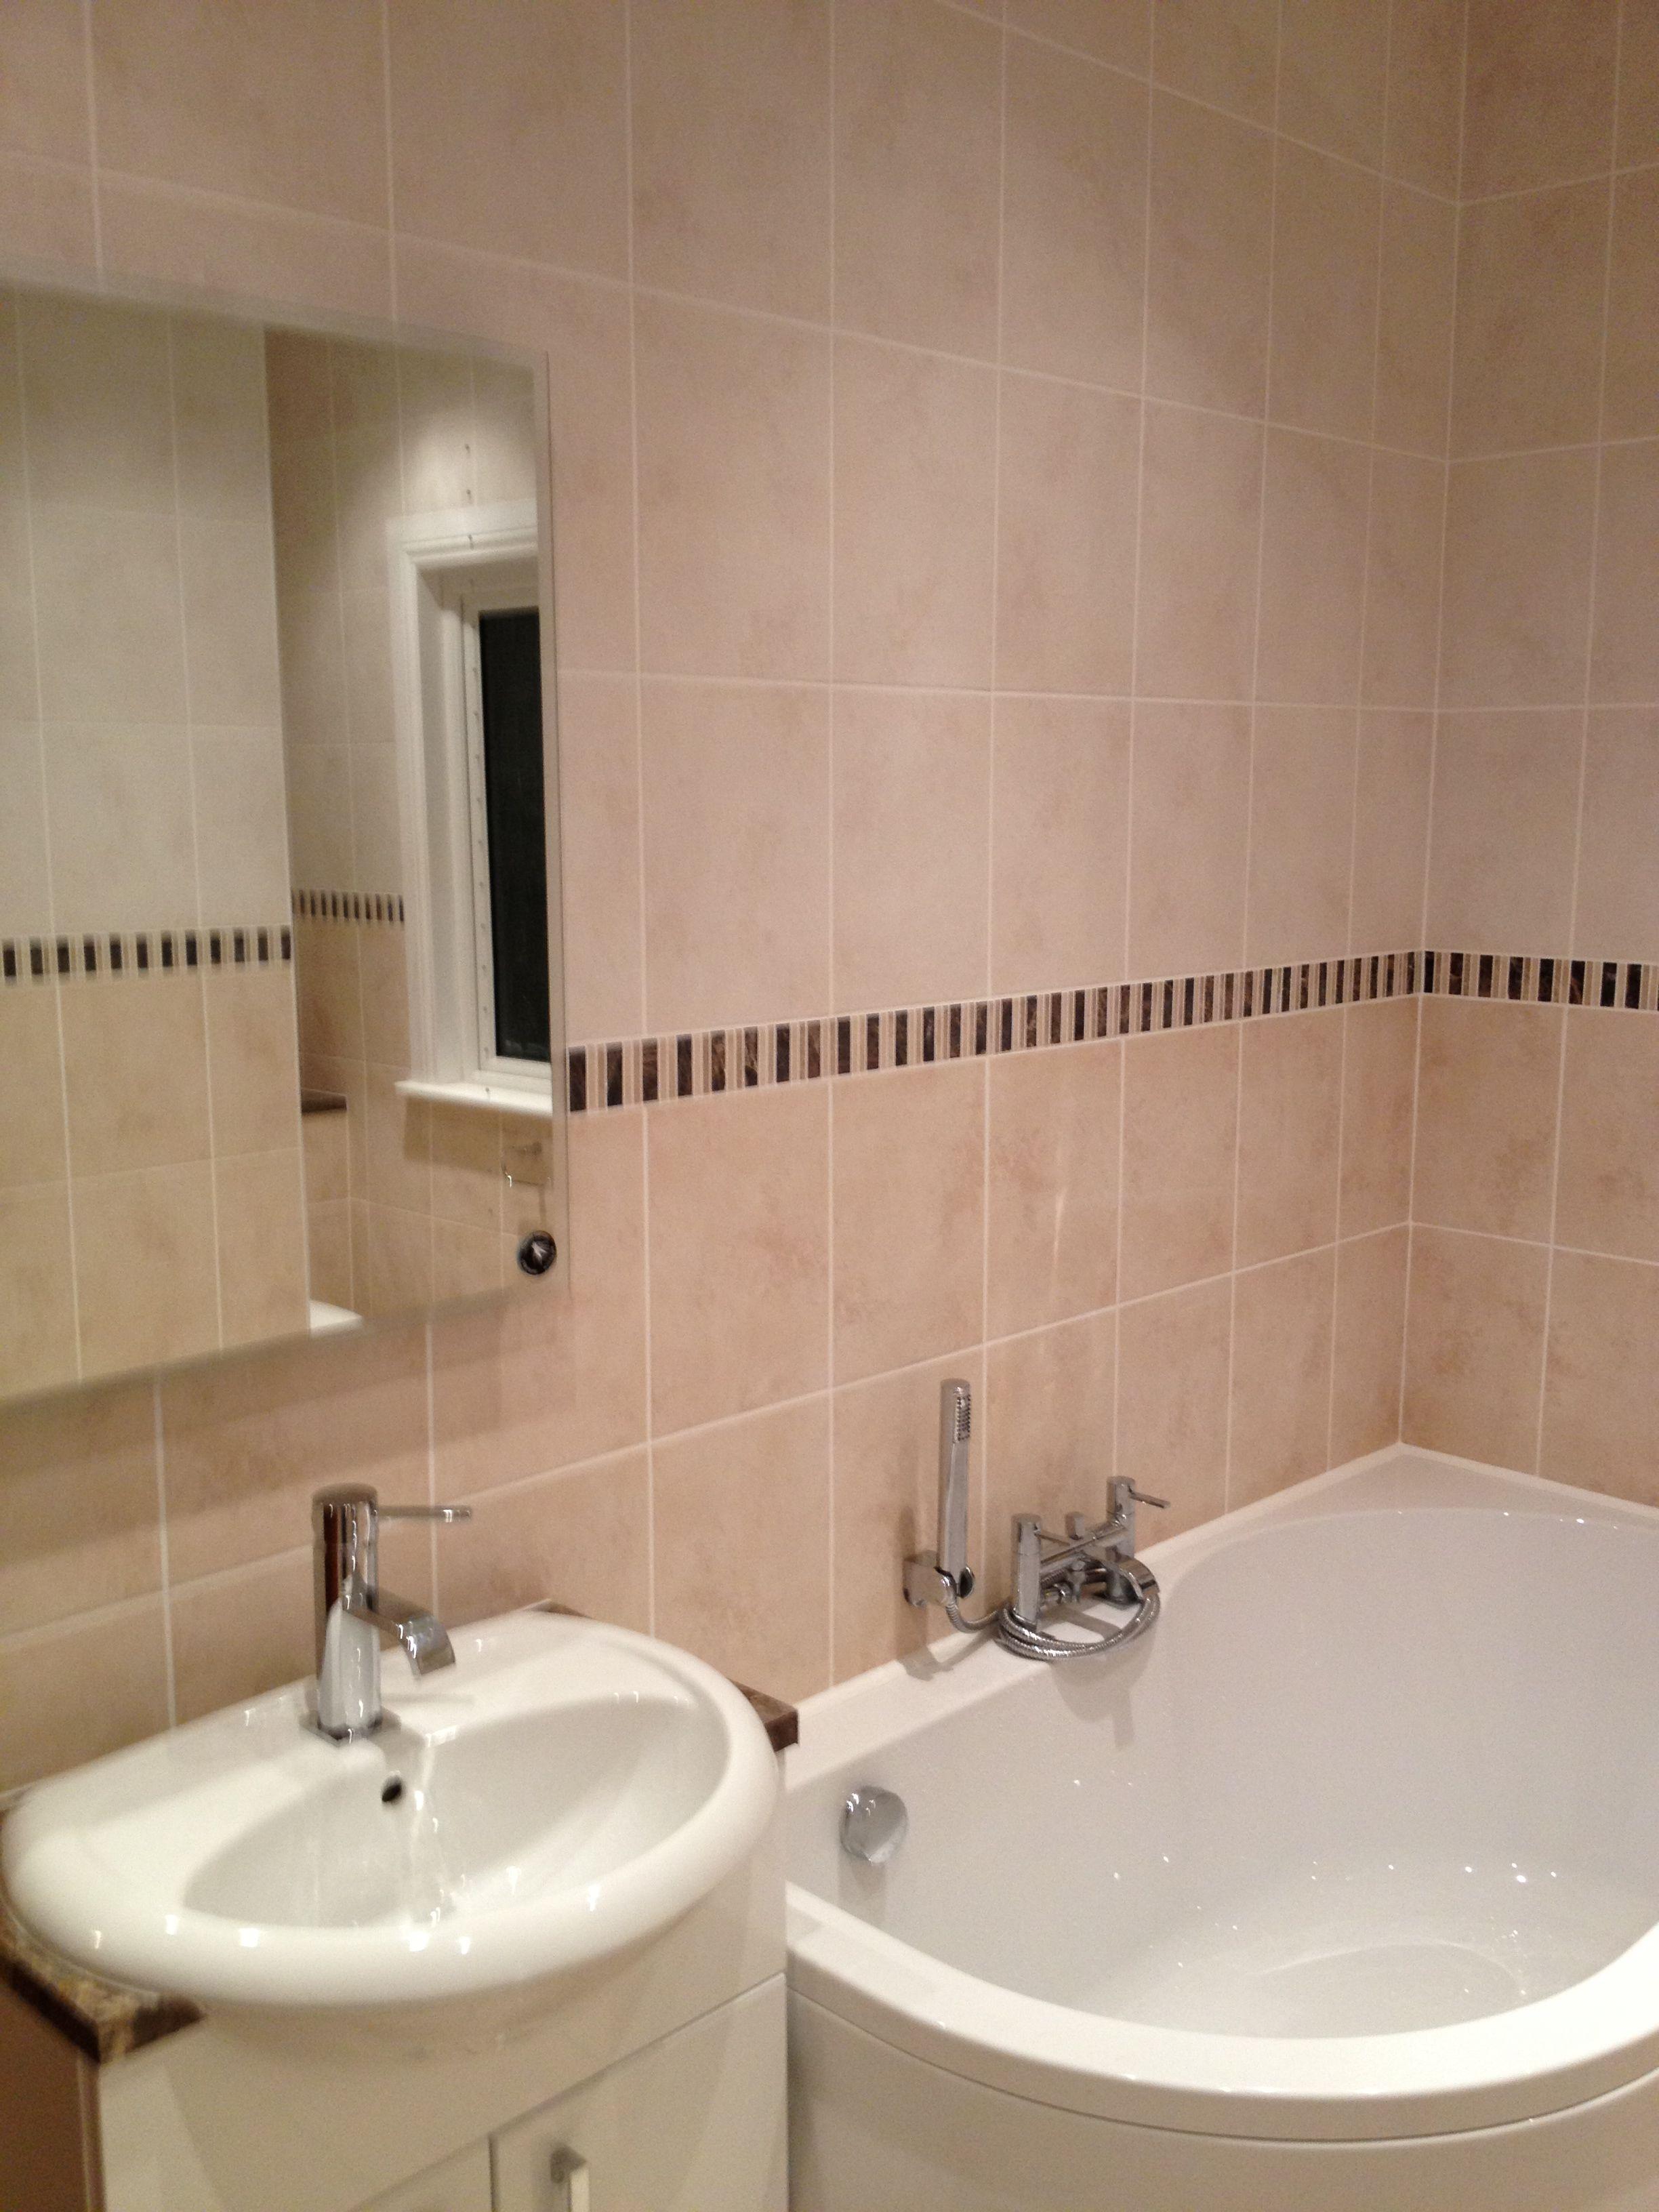 Our Bathroom Installation Service Glasgow Bathroom Design Installation Specialists Glasgow